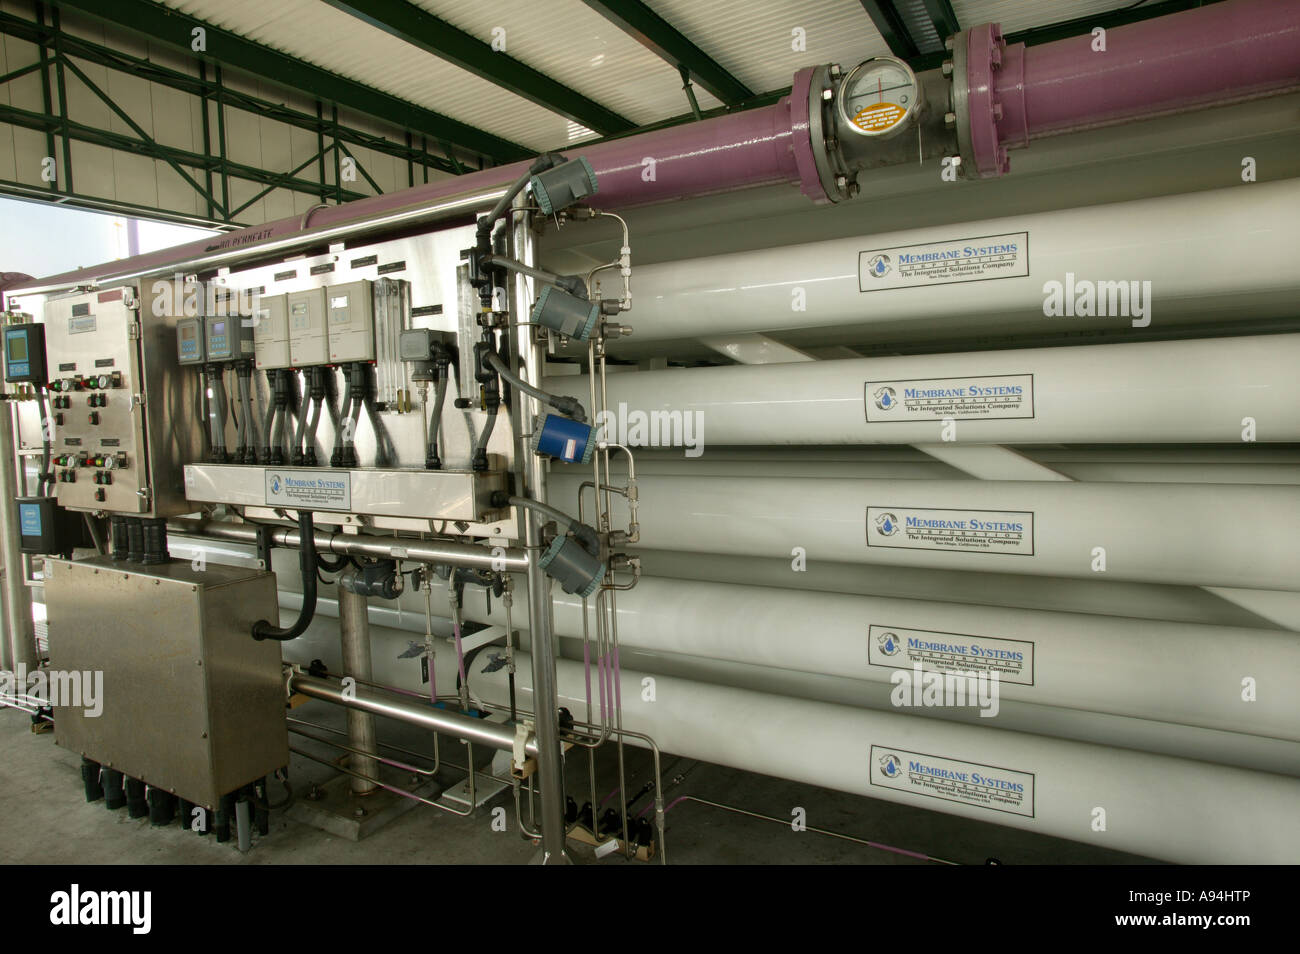 Reverse osmosis membrane units. - Stock Image